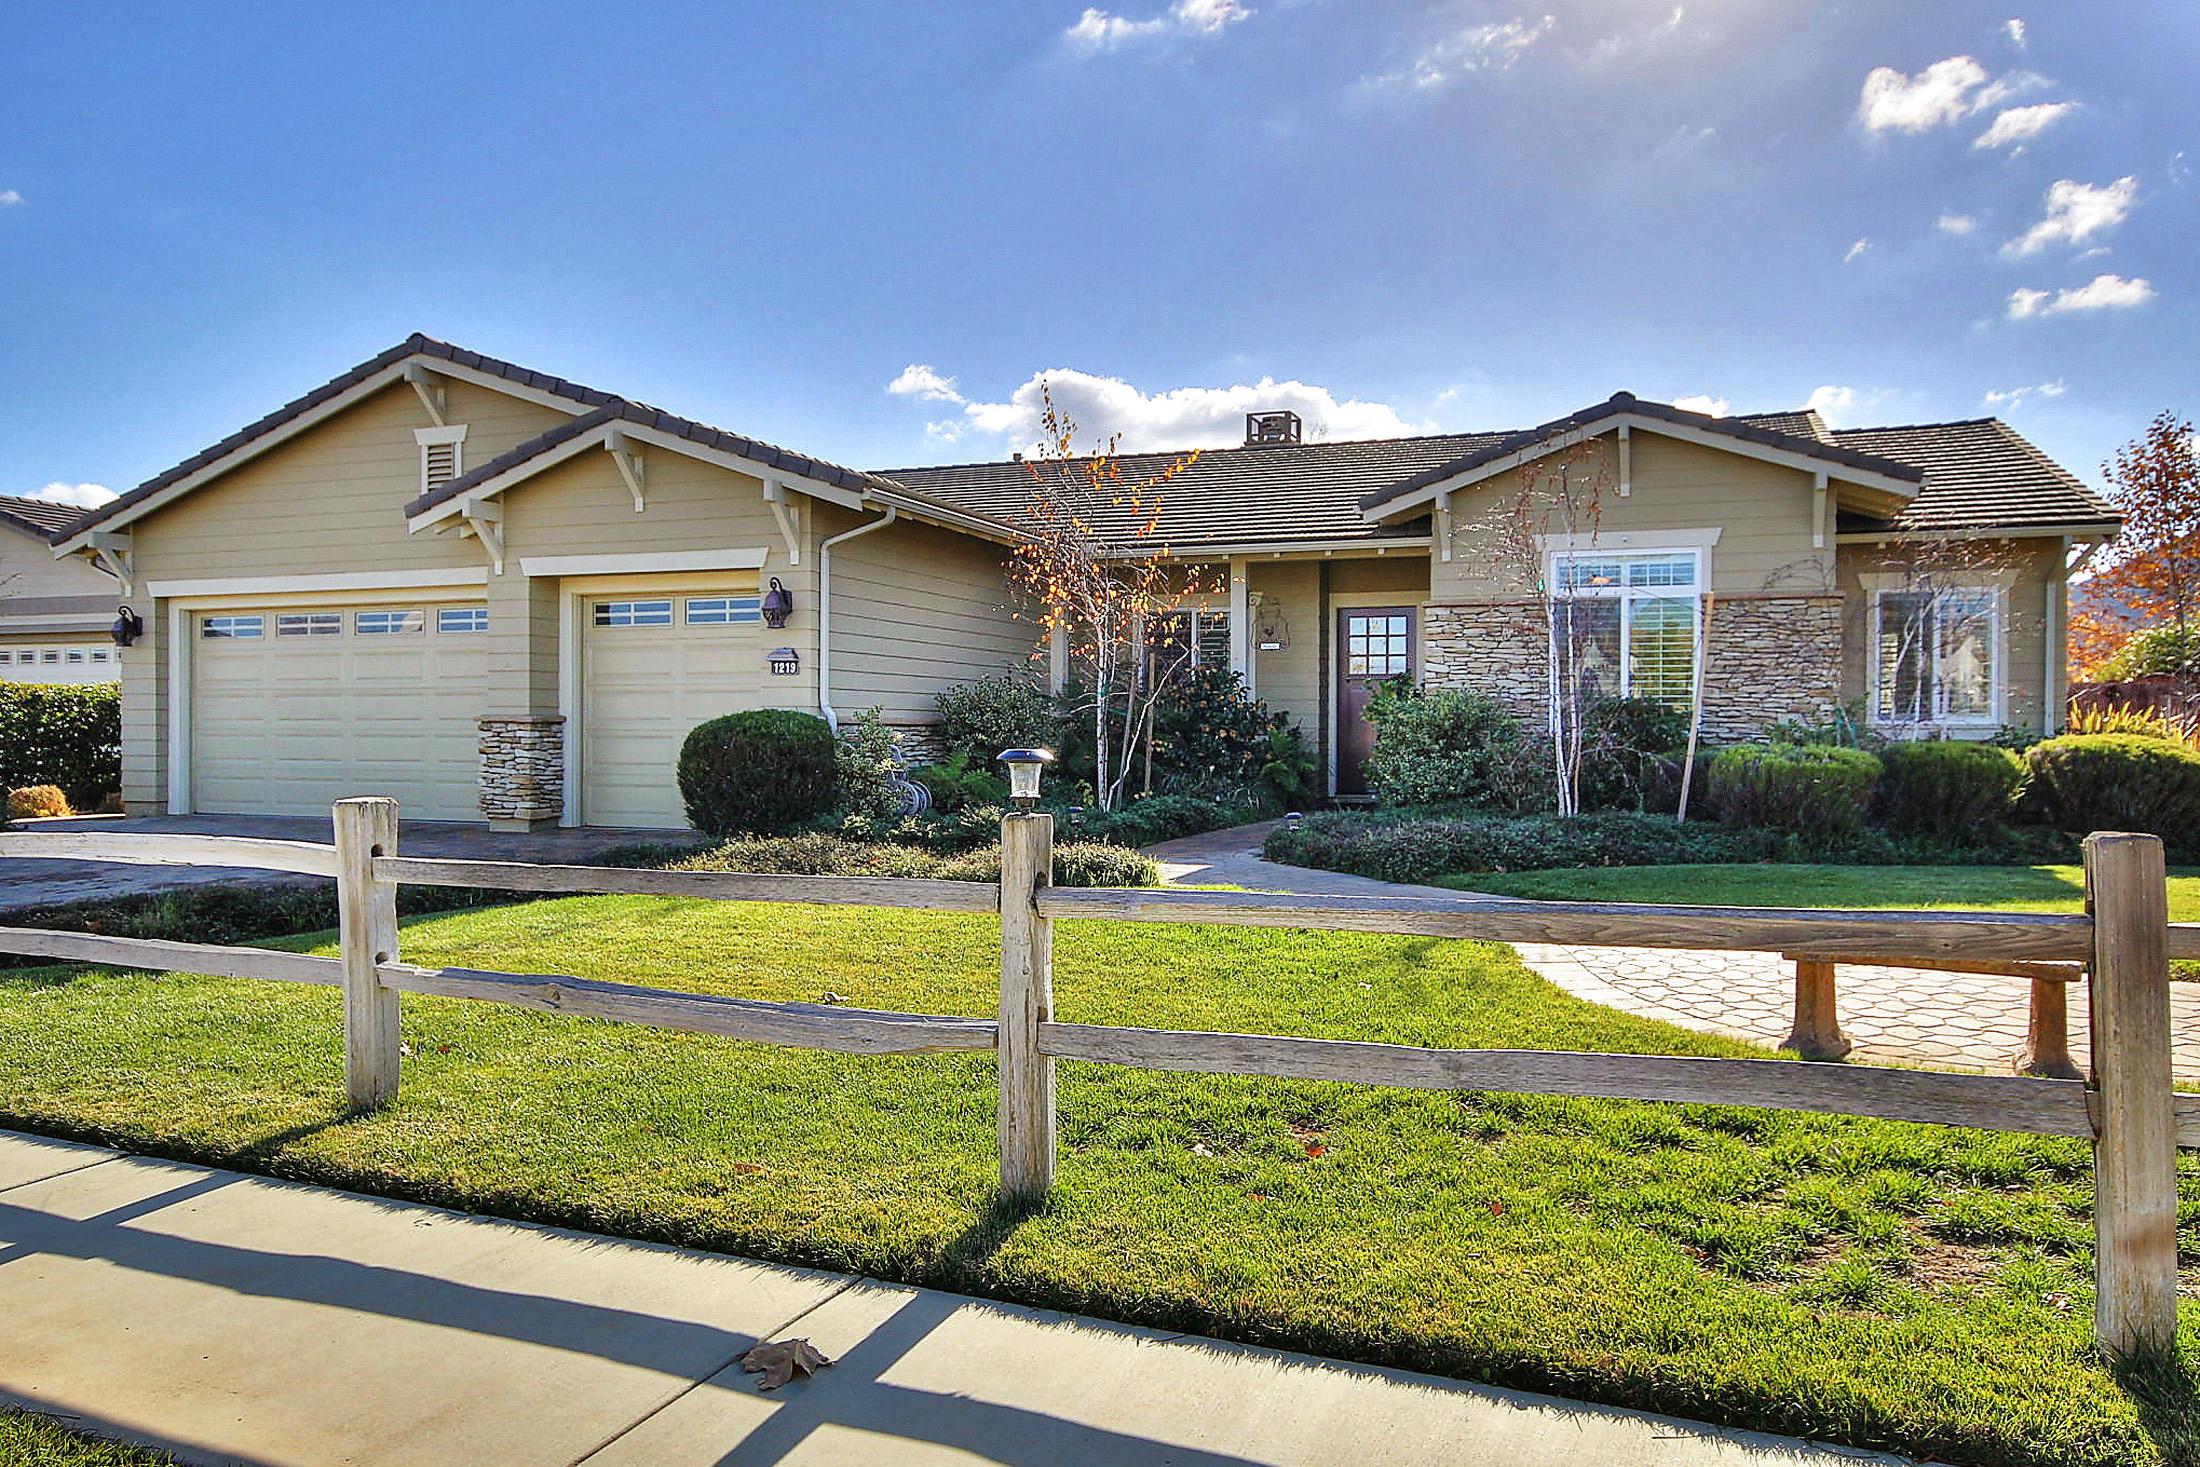 Property photo for 1219 Coast Oak Dr Solvang, California 93463 - 15-32